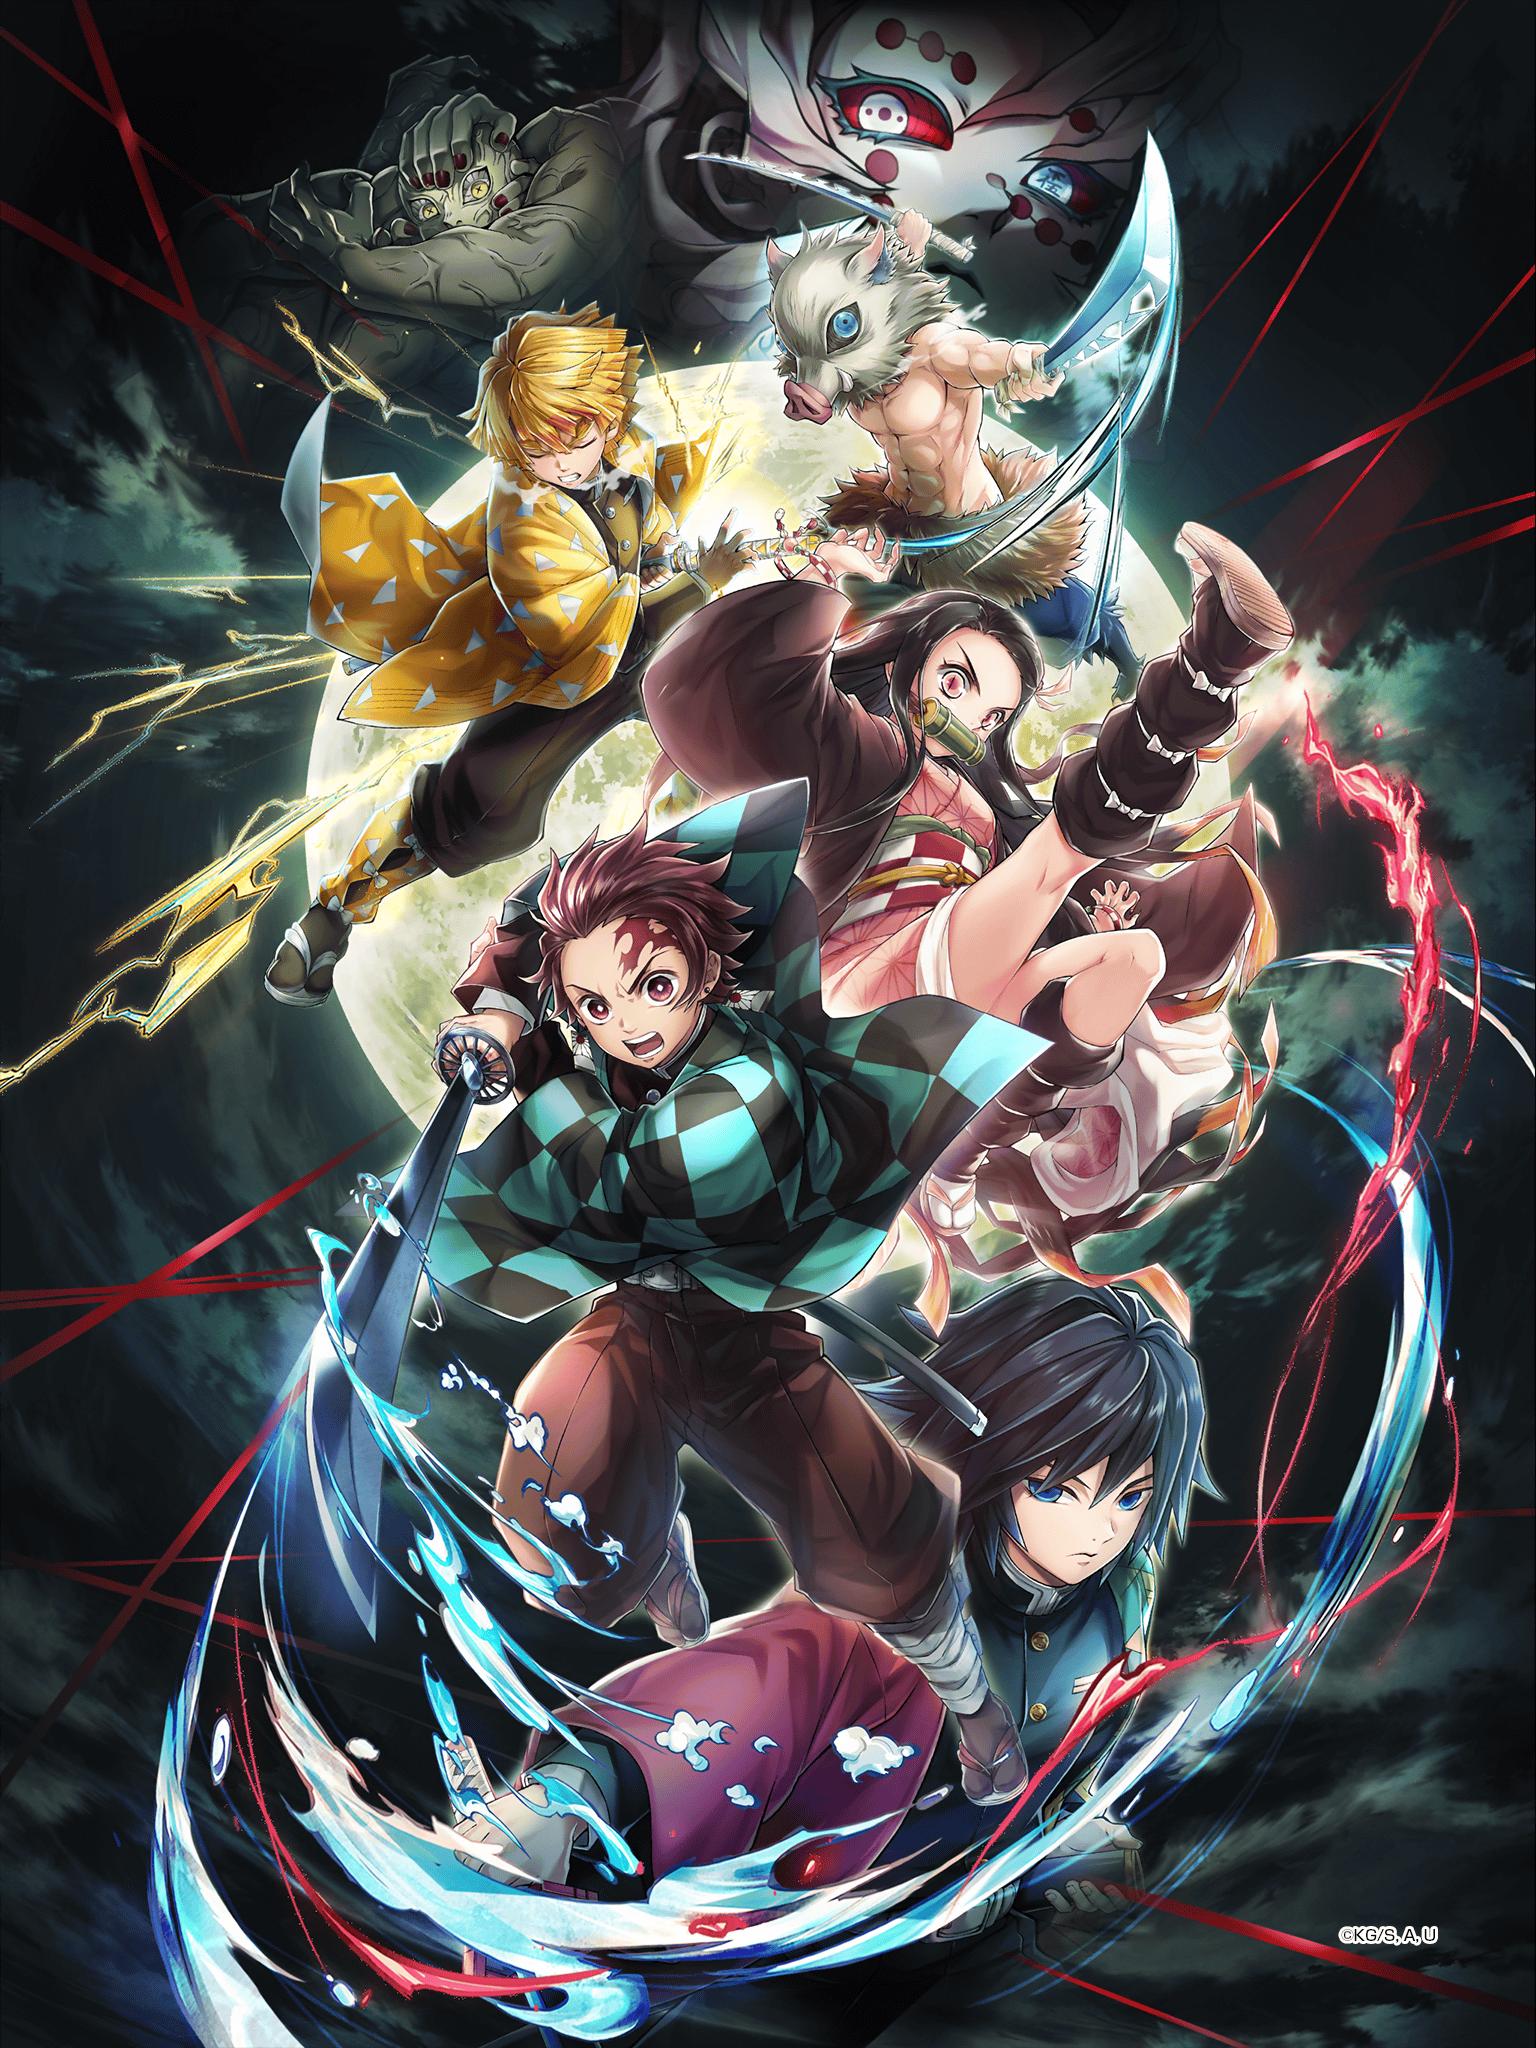 Shironeko Project Kimetsu No Yaiba Collaboration Wallpaper Hd Hq Darkneel Buster Personagens De Anime Desenho De Anime Animes Wallpapers